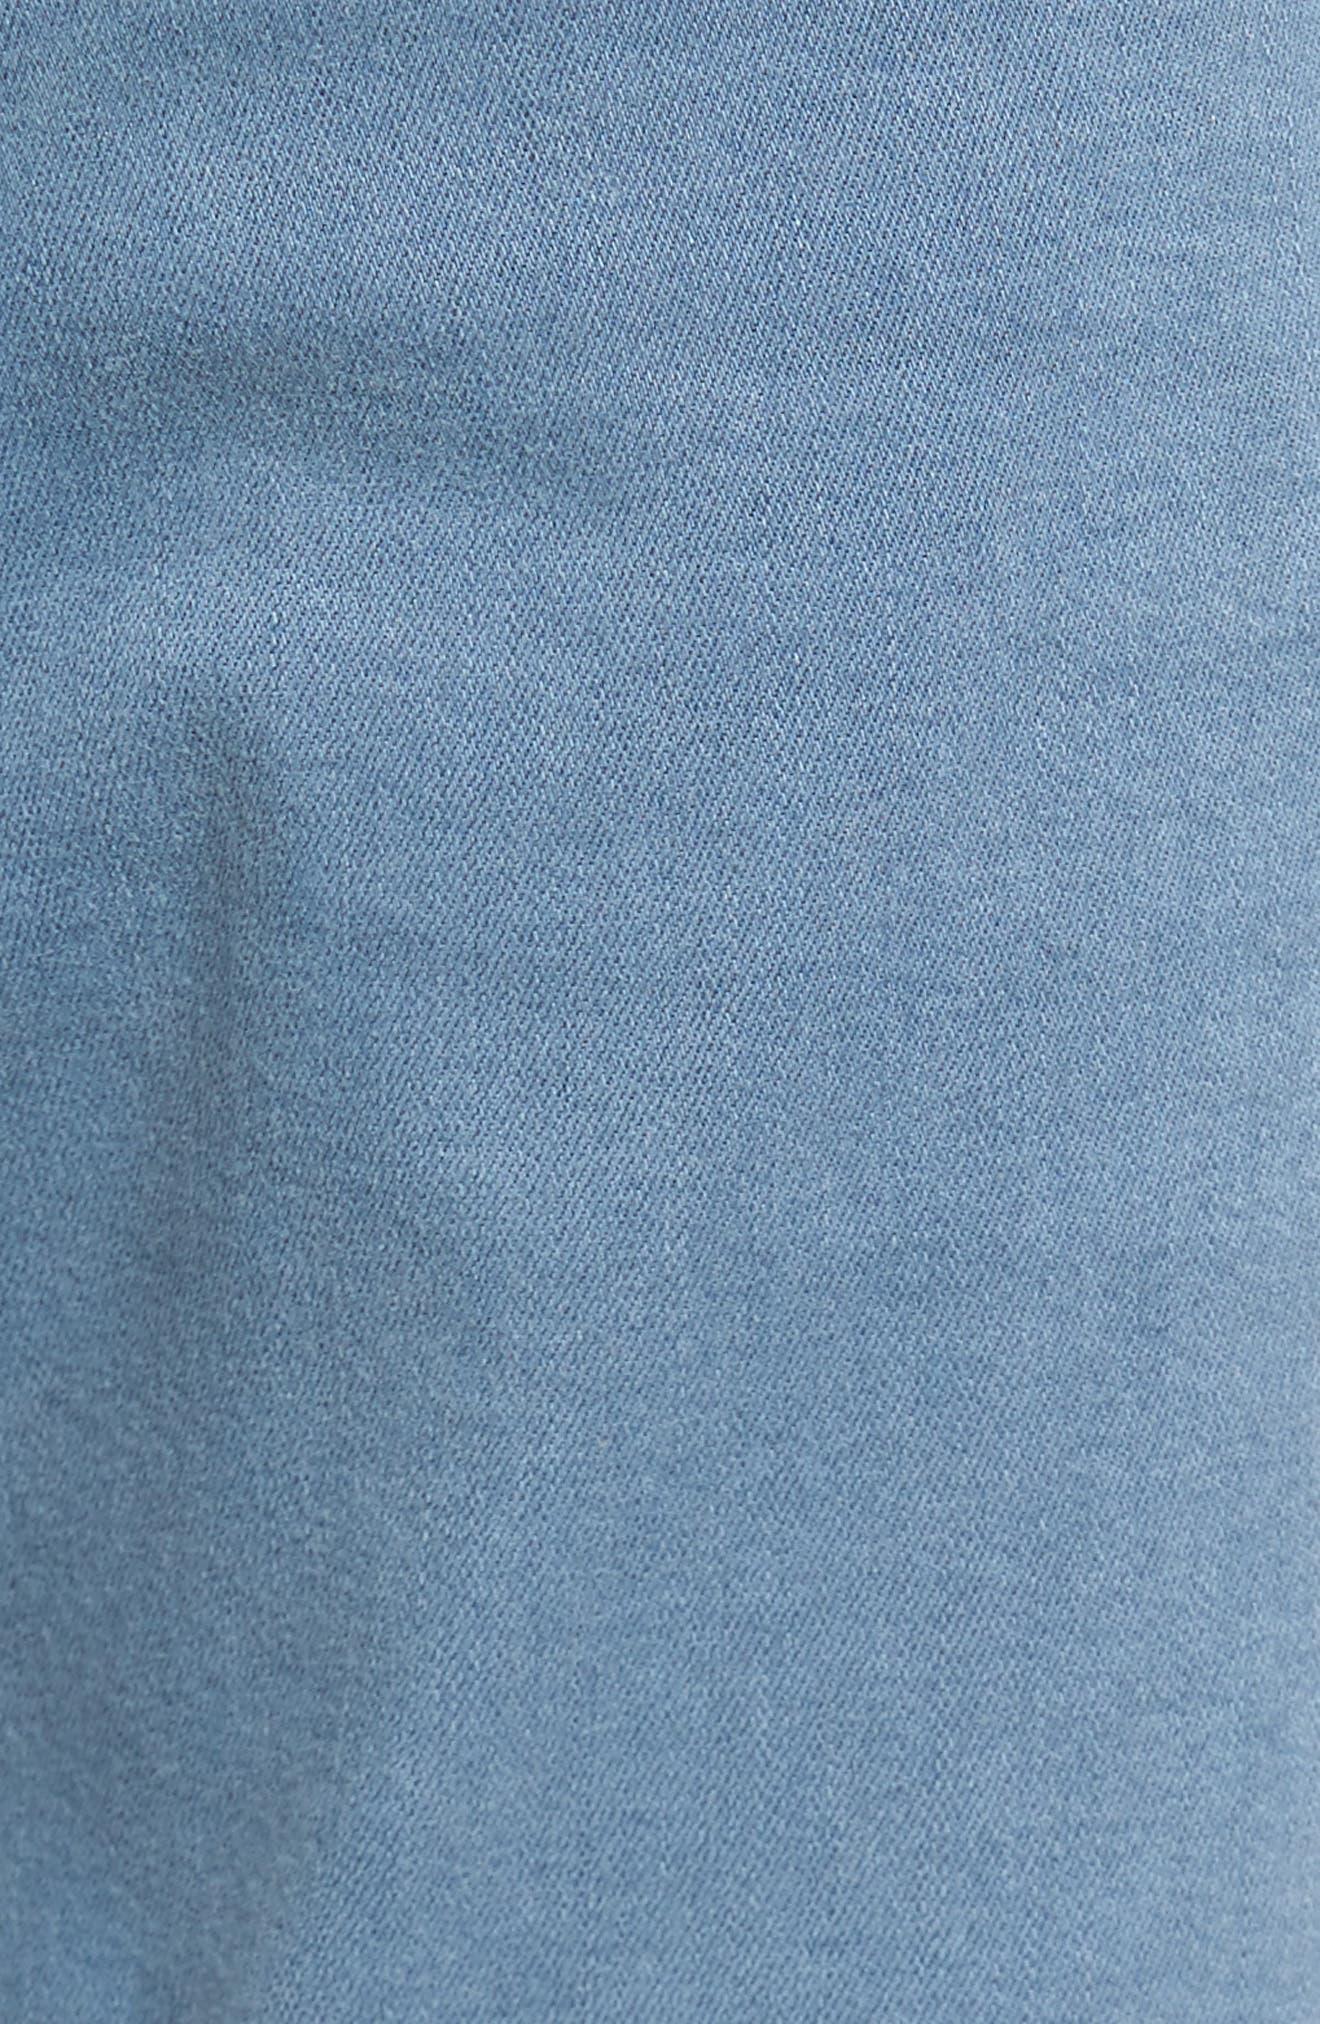 Transcend - Lennox Slim Fit Jeans,                             Alternate thumbnail 5, color,                             430